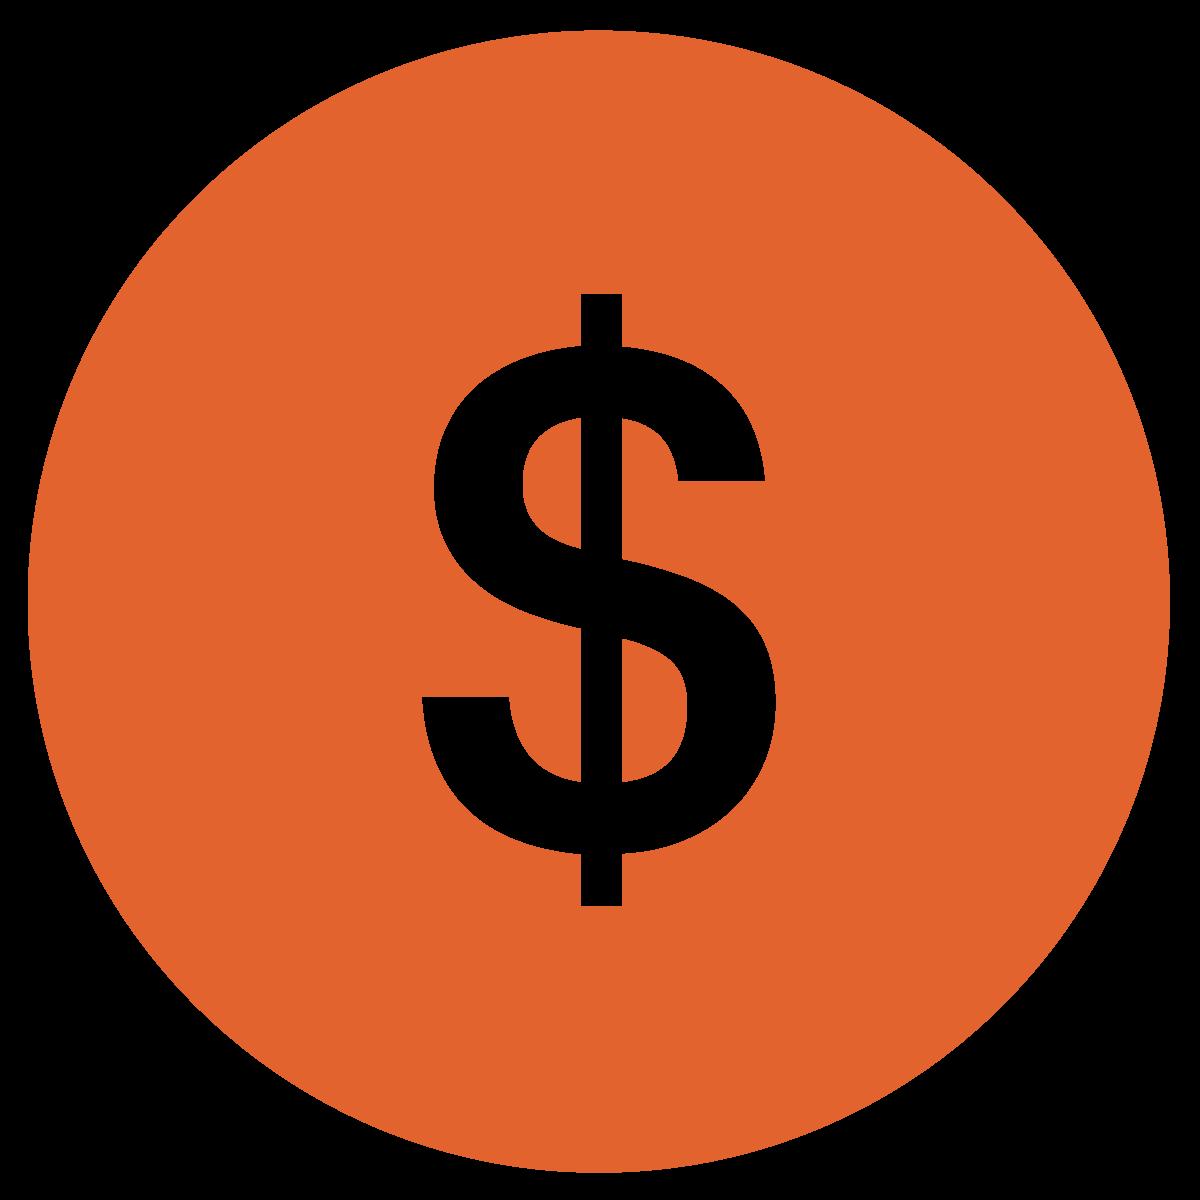 white dollar sign in a dark orange circle